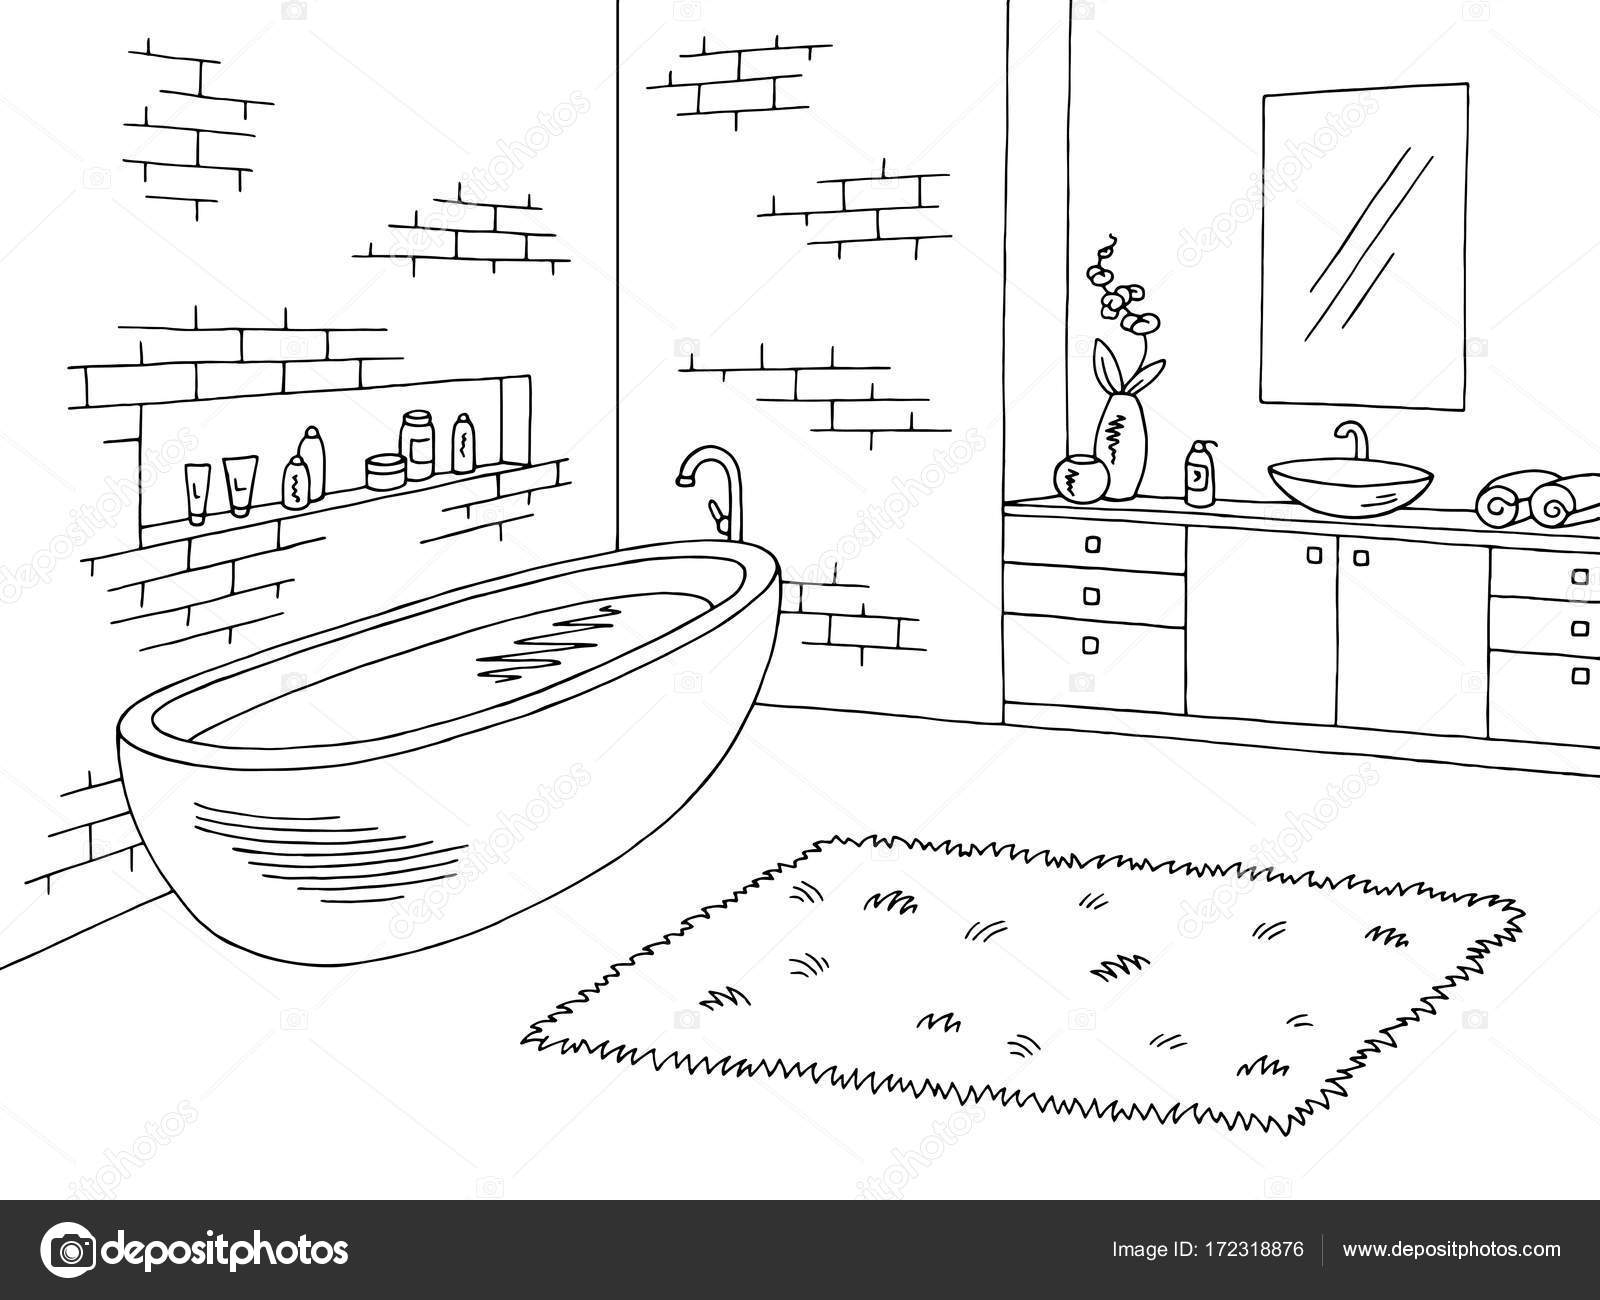 Dibujos De Baños Delflanddepotopnl